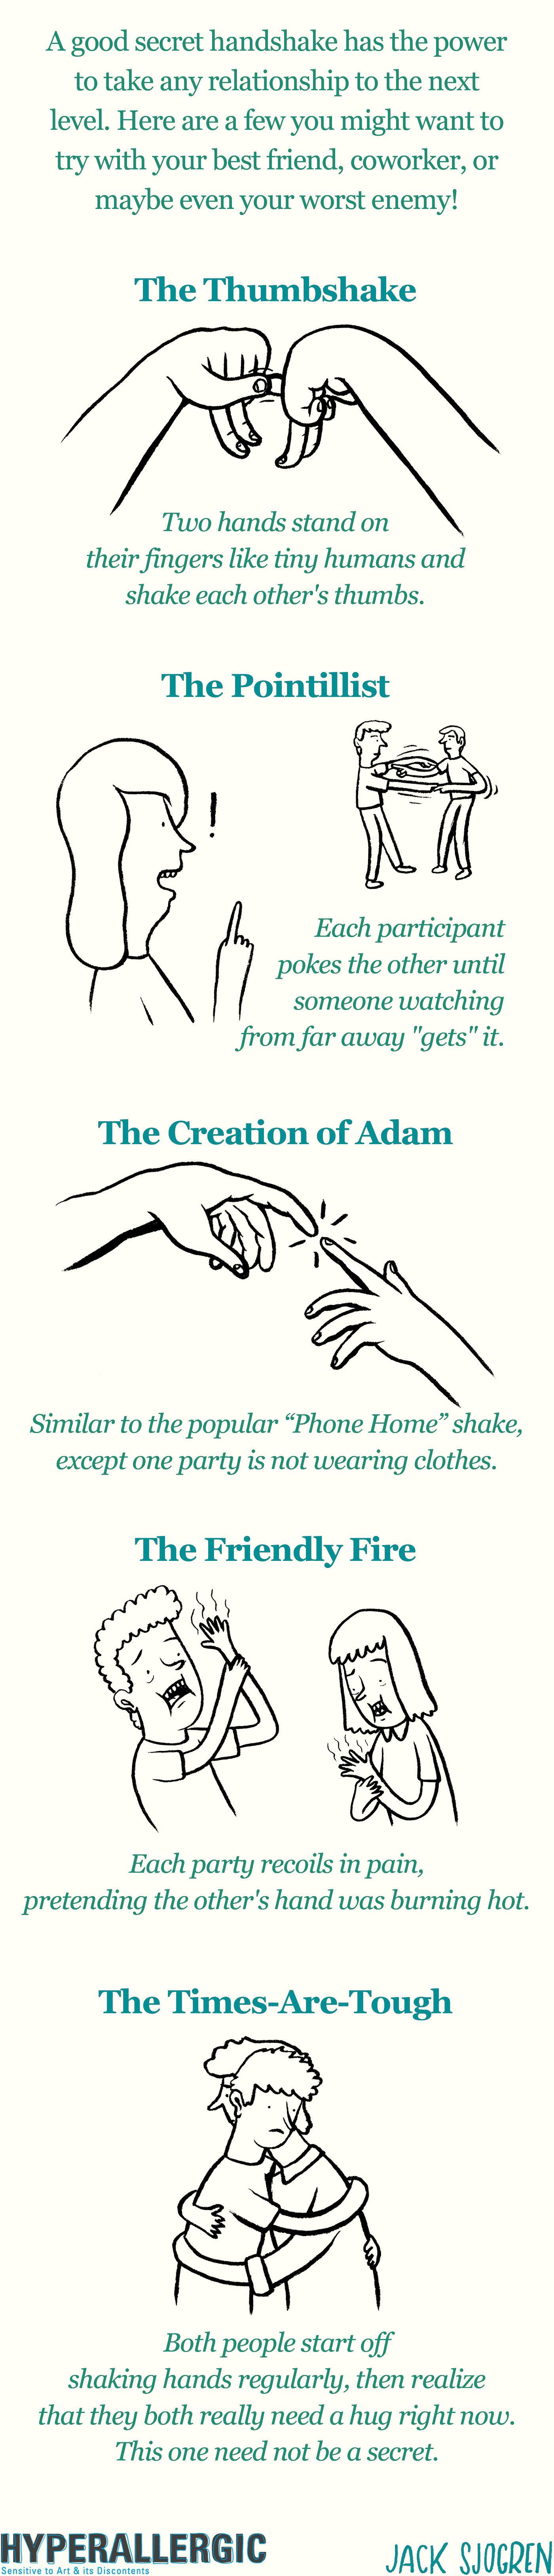 Secret handshakes for everyday use